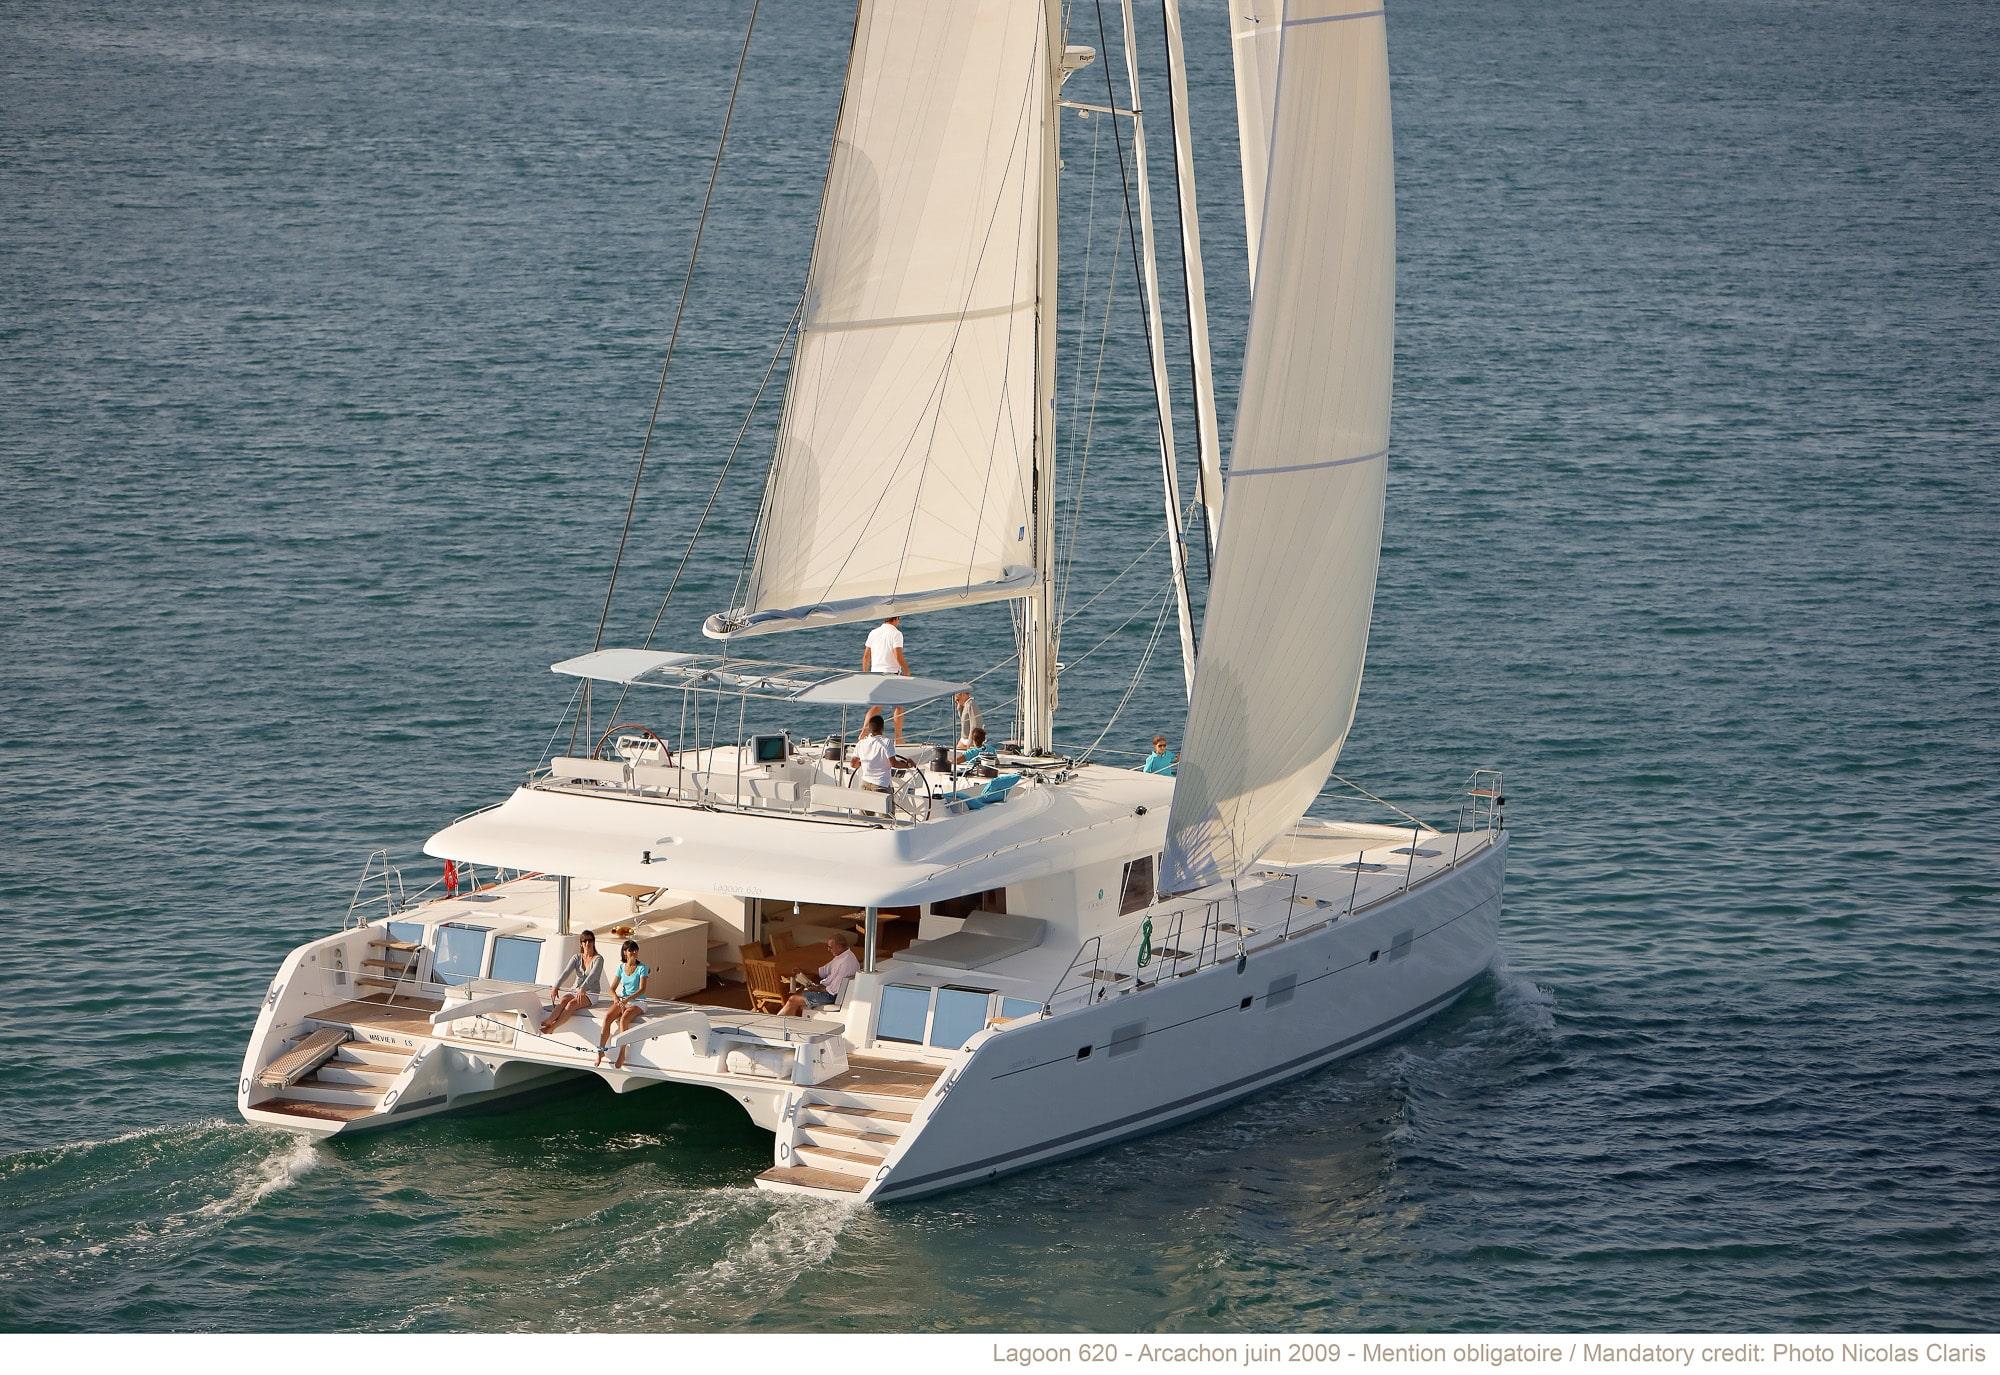 lagoon-620-charter-croatia-rental